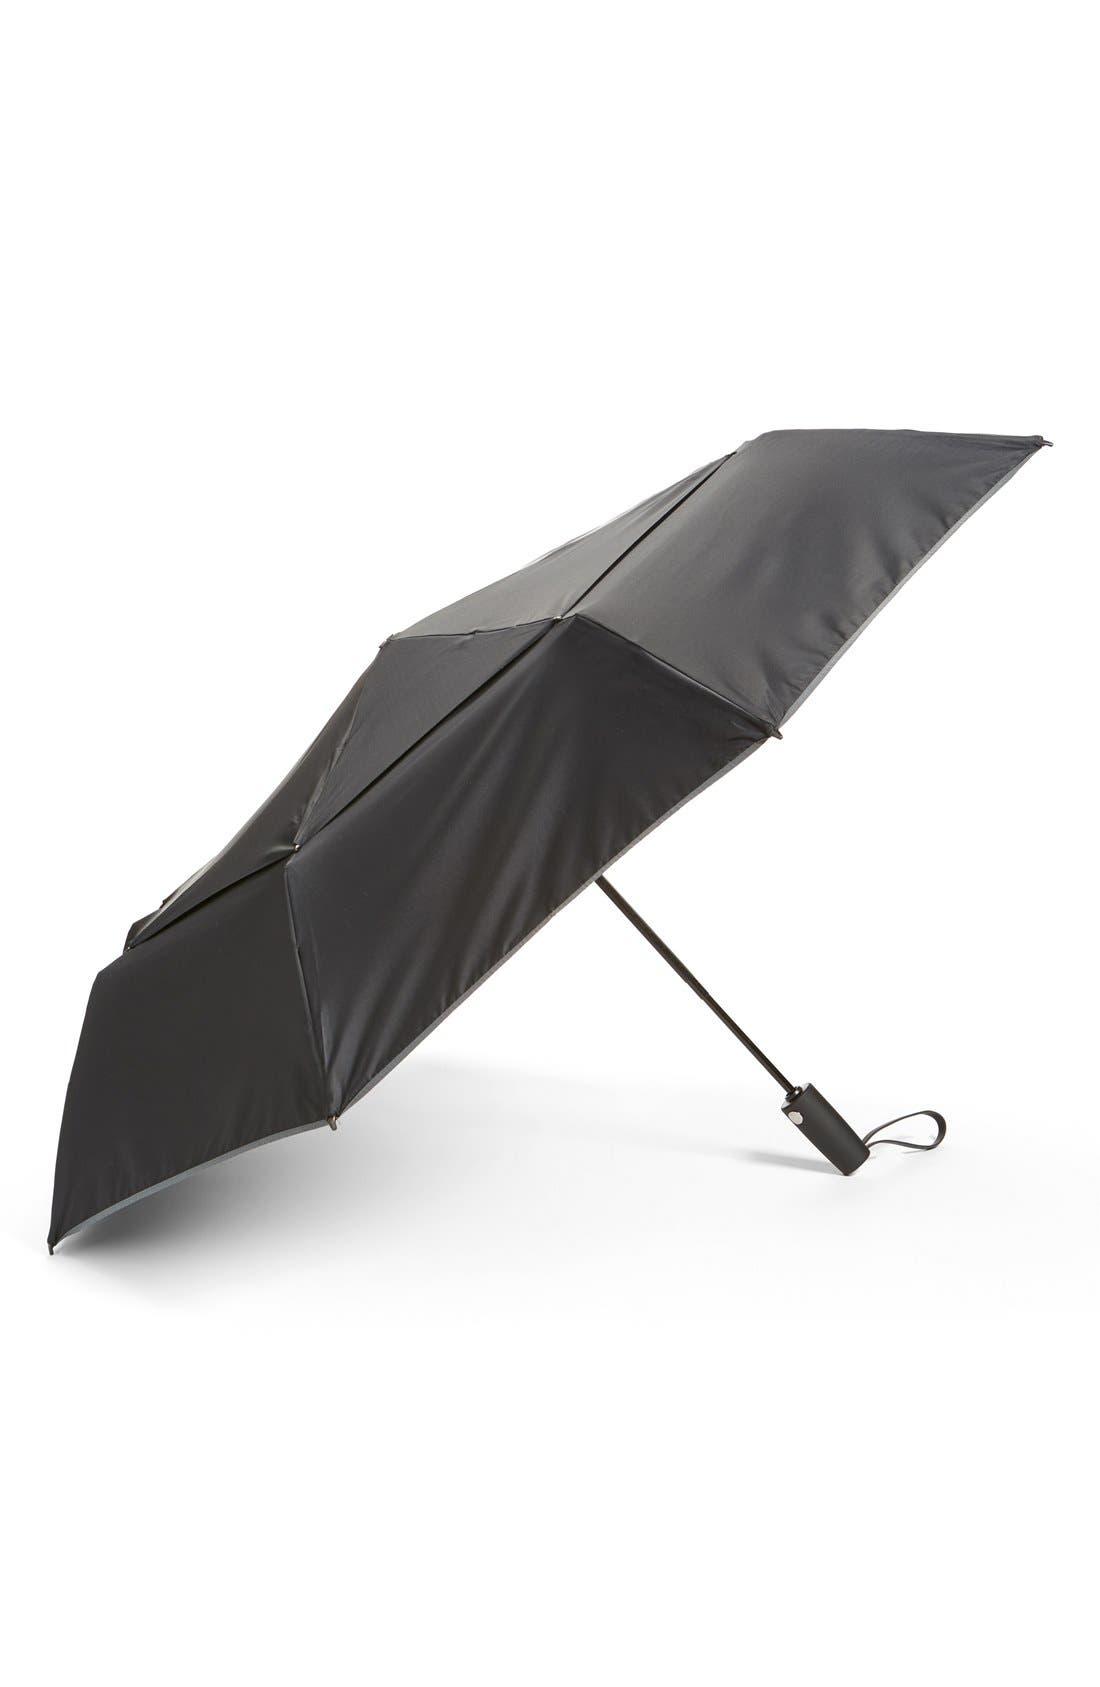 Large Auto Close Umbrella,                             Main thumbnail 1, color,                             001